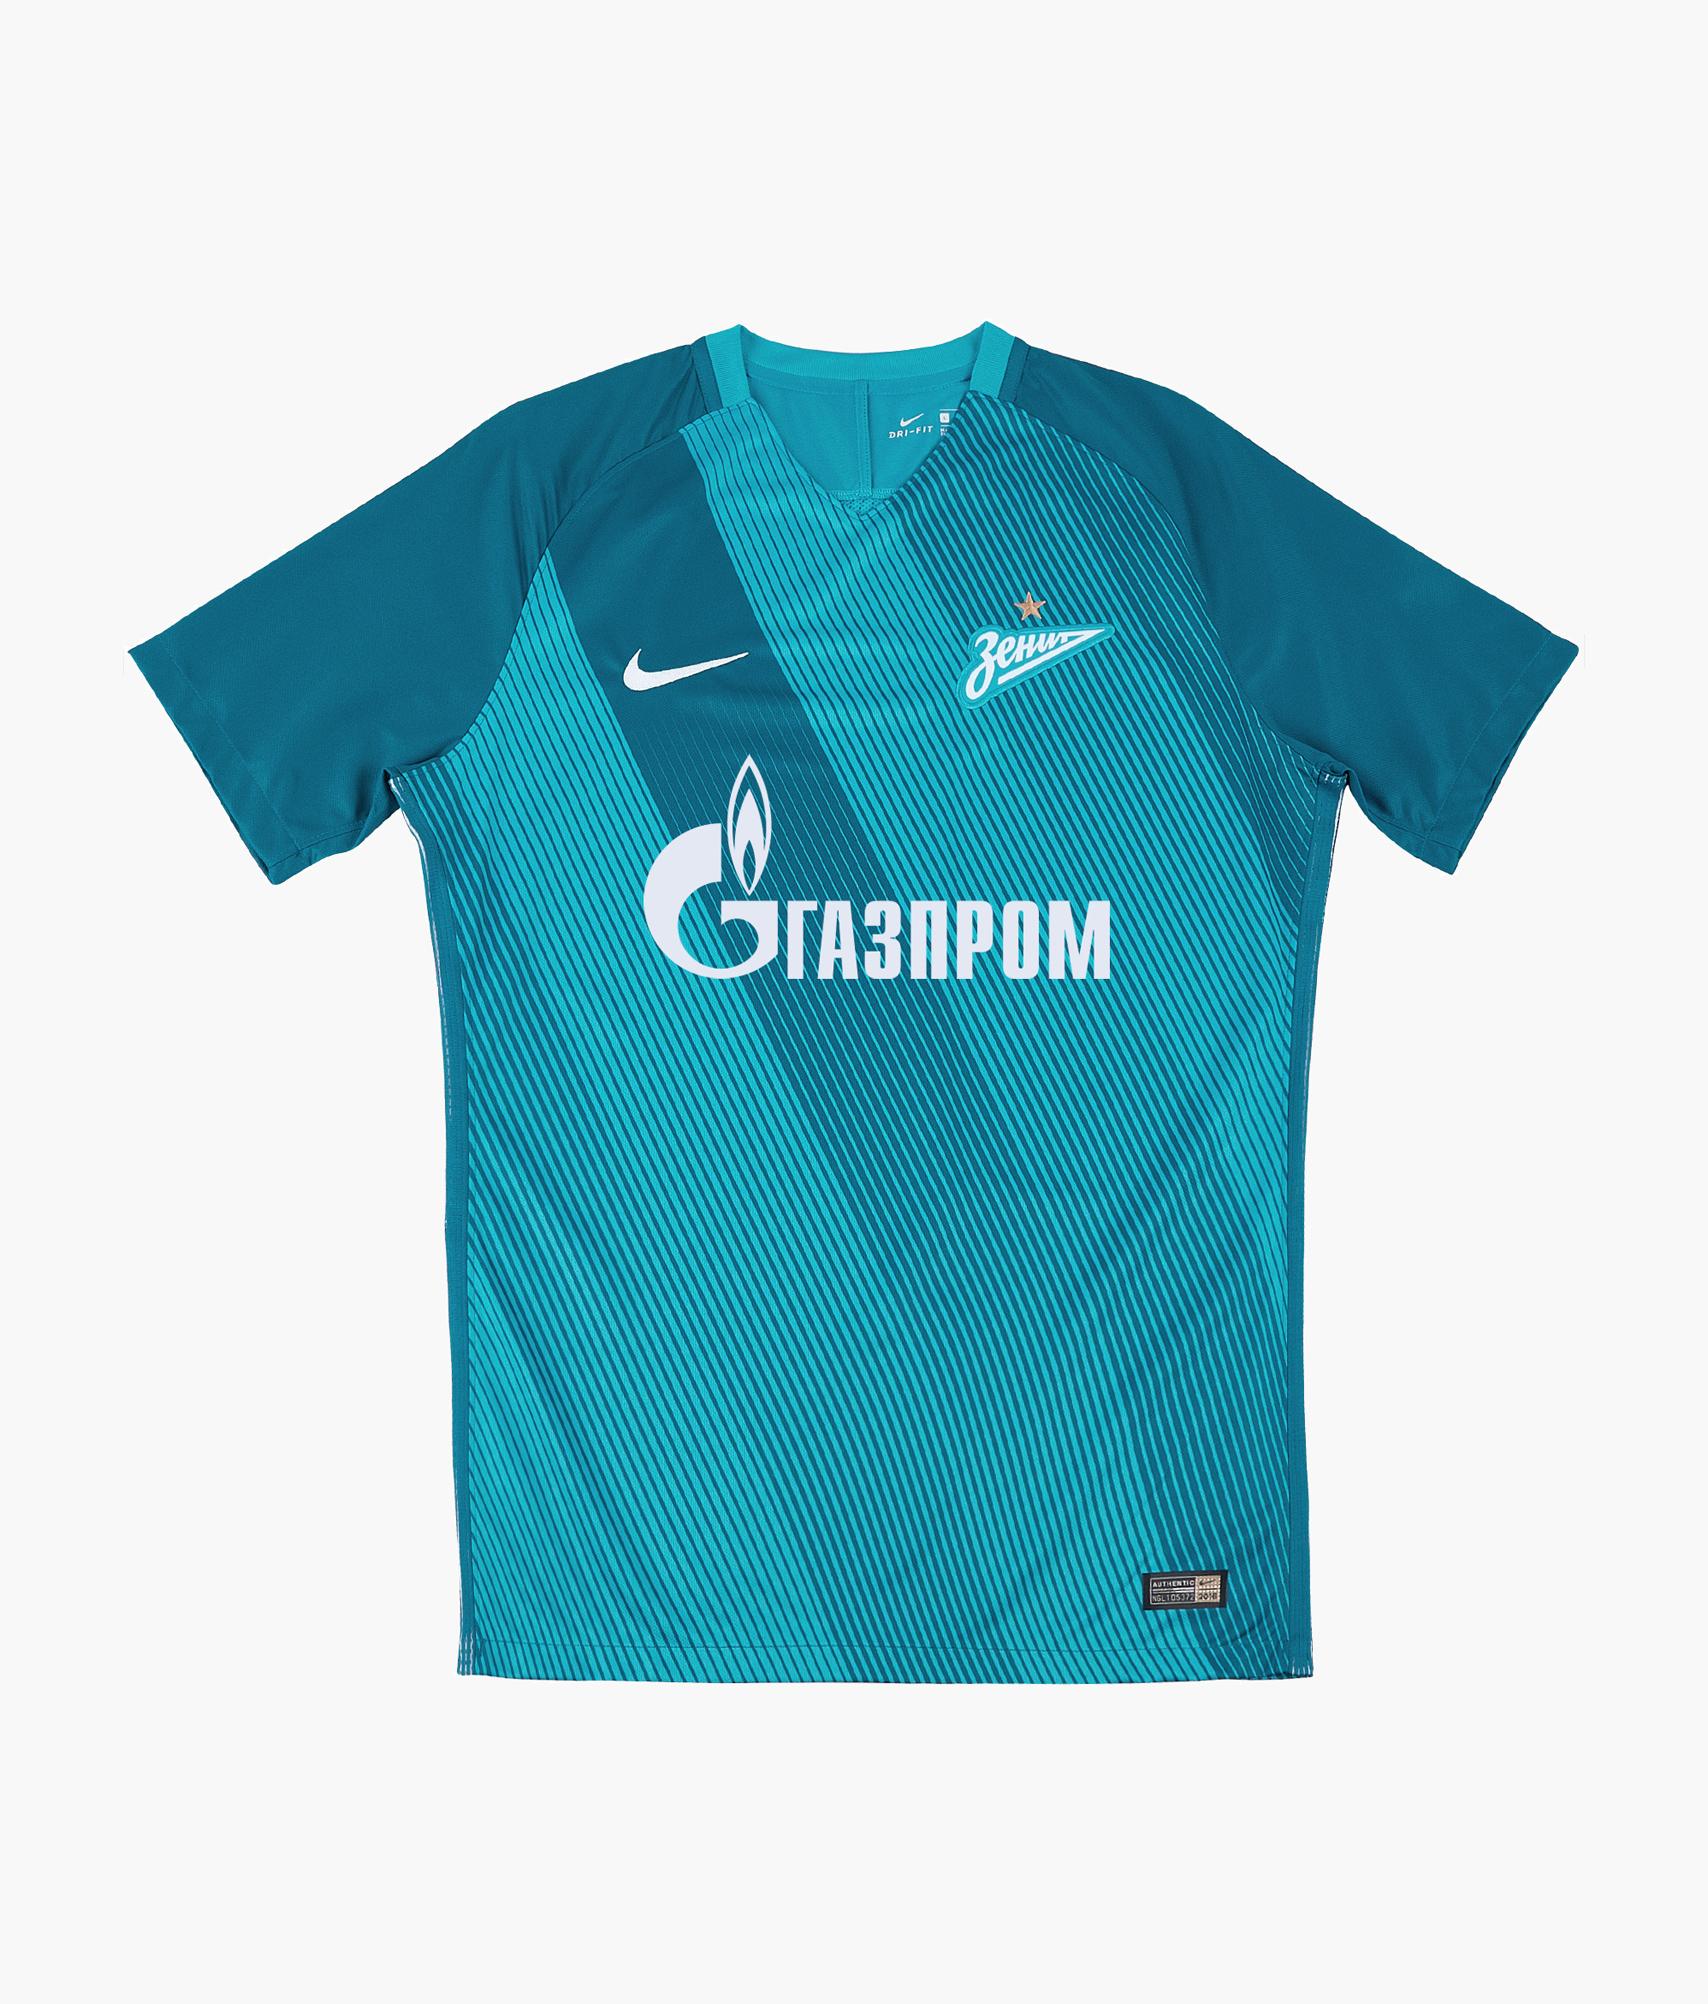 цена Домашняя оригинальная футболка Nike Nike Цвет-Синий онлайн в 2017 году